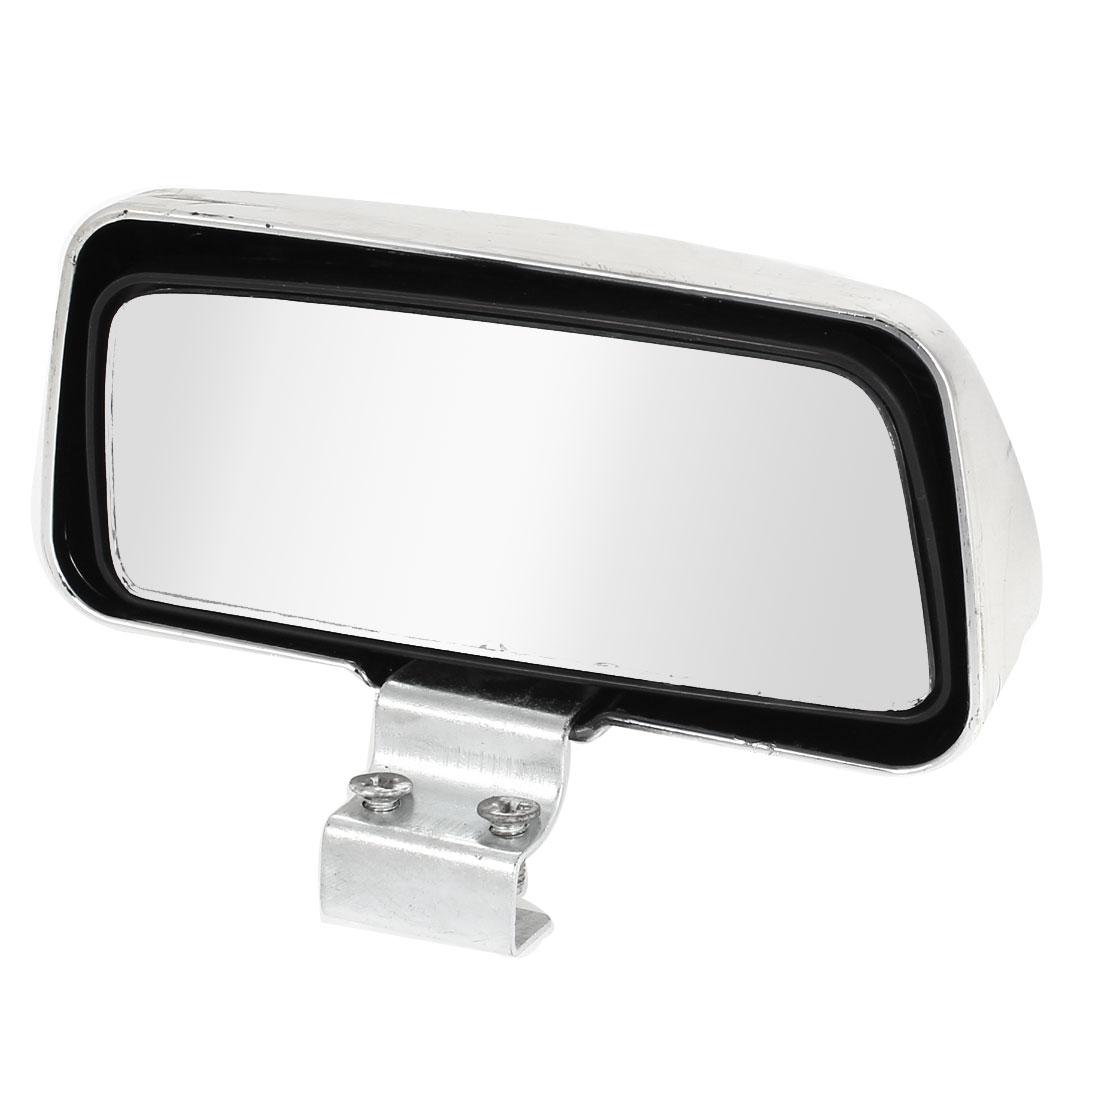 Universal Car Adhesive Rear View Blind Spot Mirror Silver Tone 11 x 4.5cm